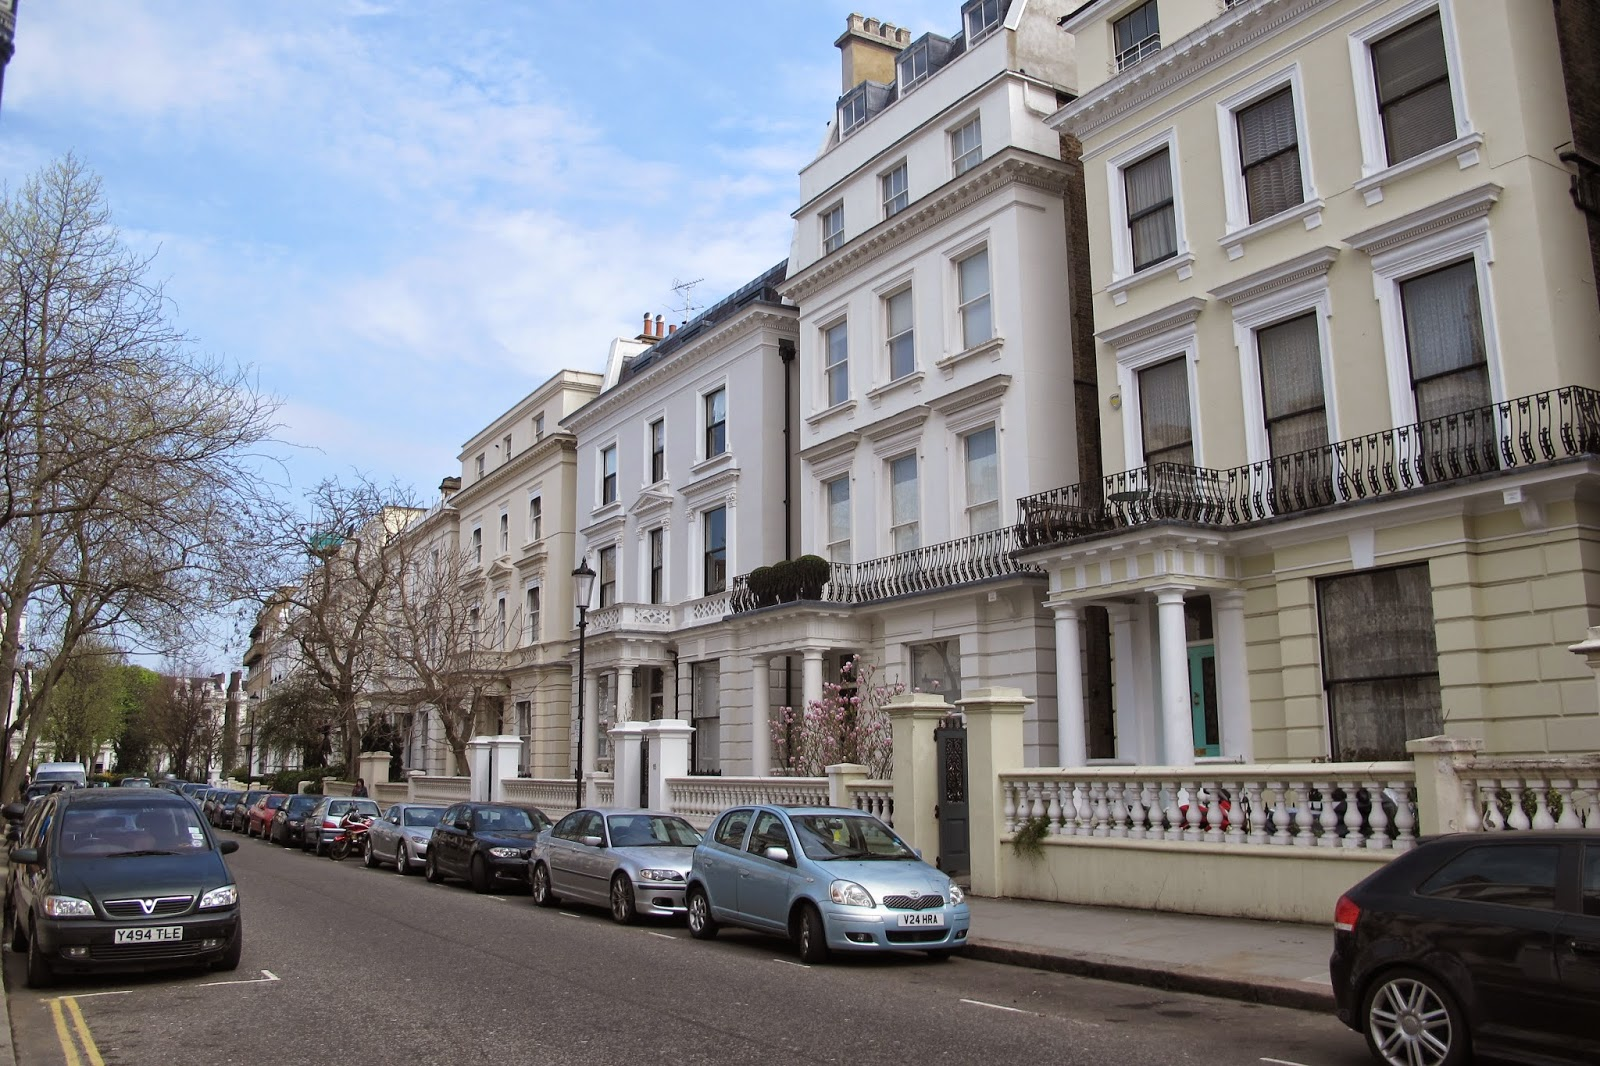 ledbury road notting hill london uk travel adventure. Black Bedroom Furniture Sets. Home Design Ideas